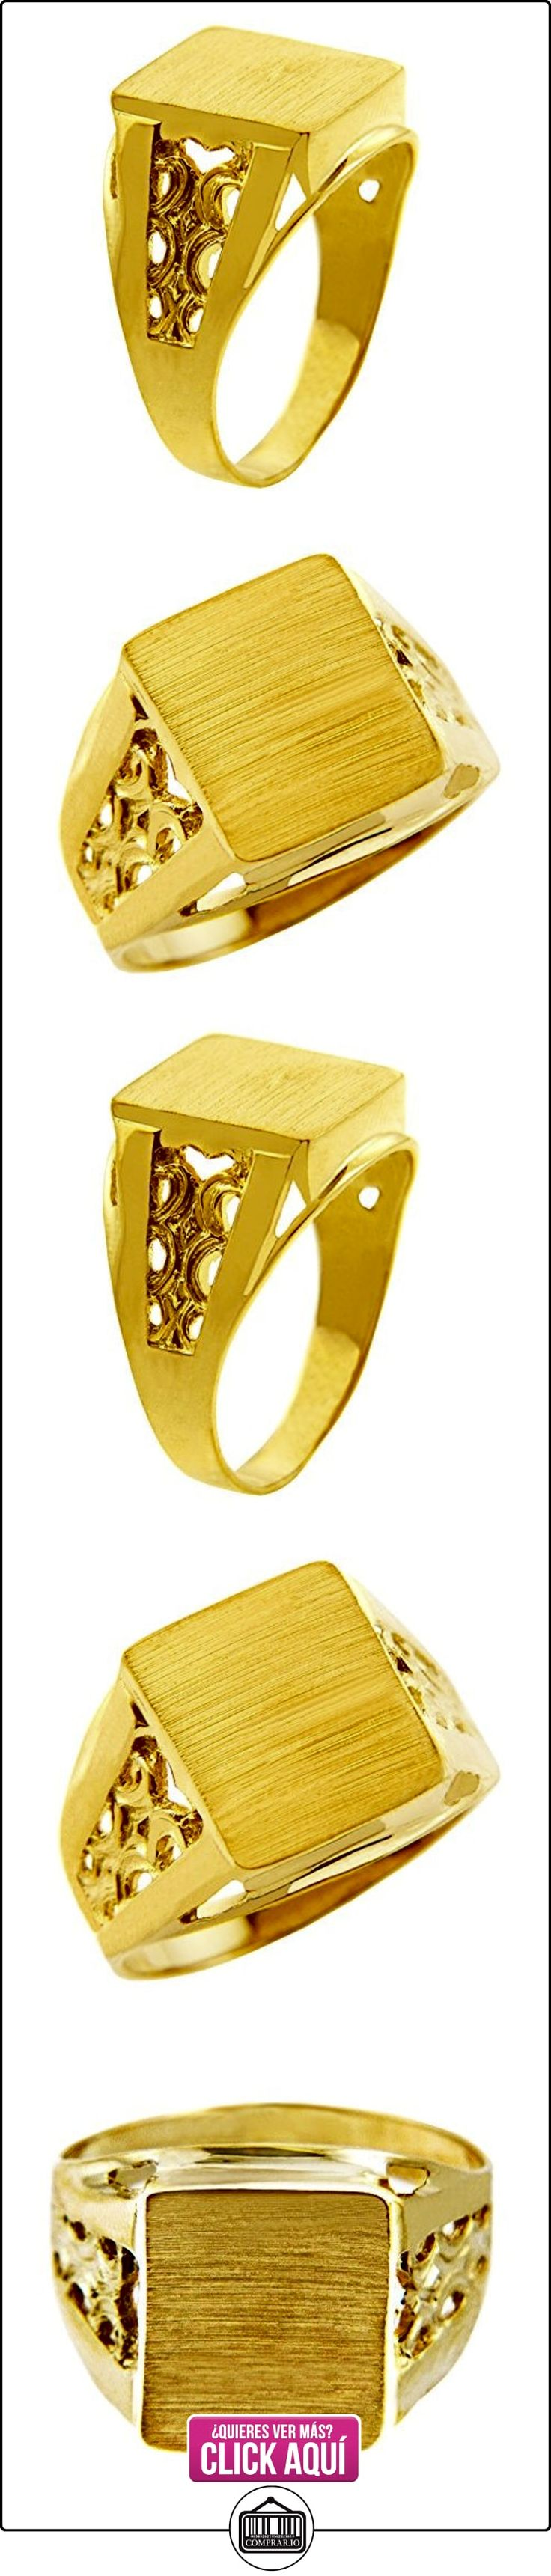 Pequeños Tesoros - Anillos Hombres Alianza De Boda 10 Kt Oro 471/1000 Sortija De sello  ✿ Joyas para hombres especiales - lujo ✿ ▬► Ver oferta: https://comprar.io/goto/B01277W1OG